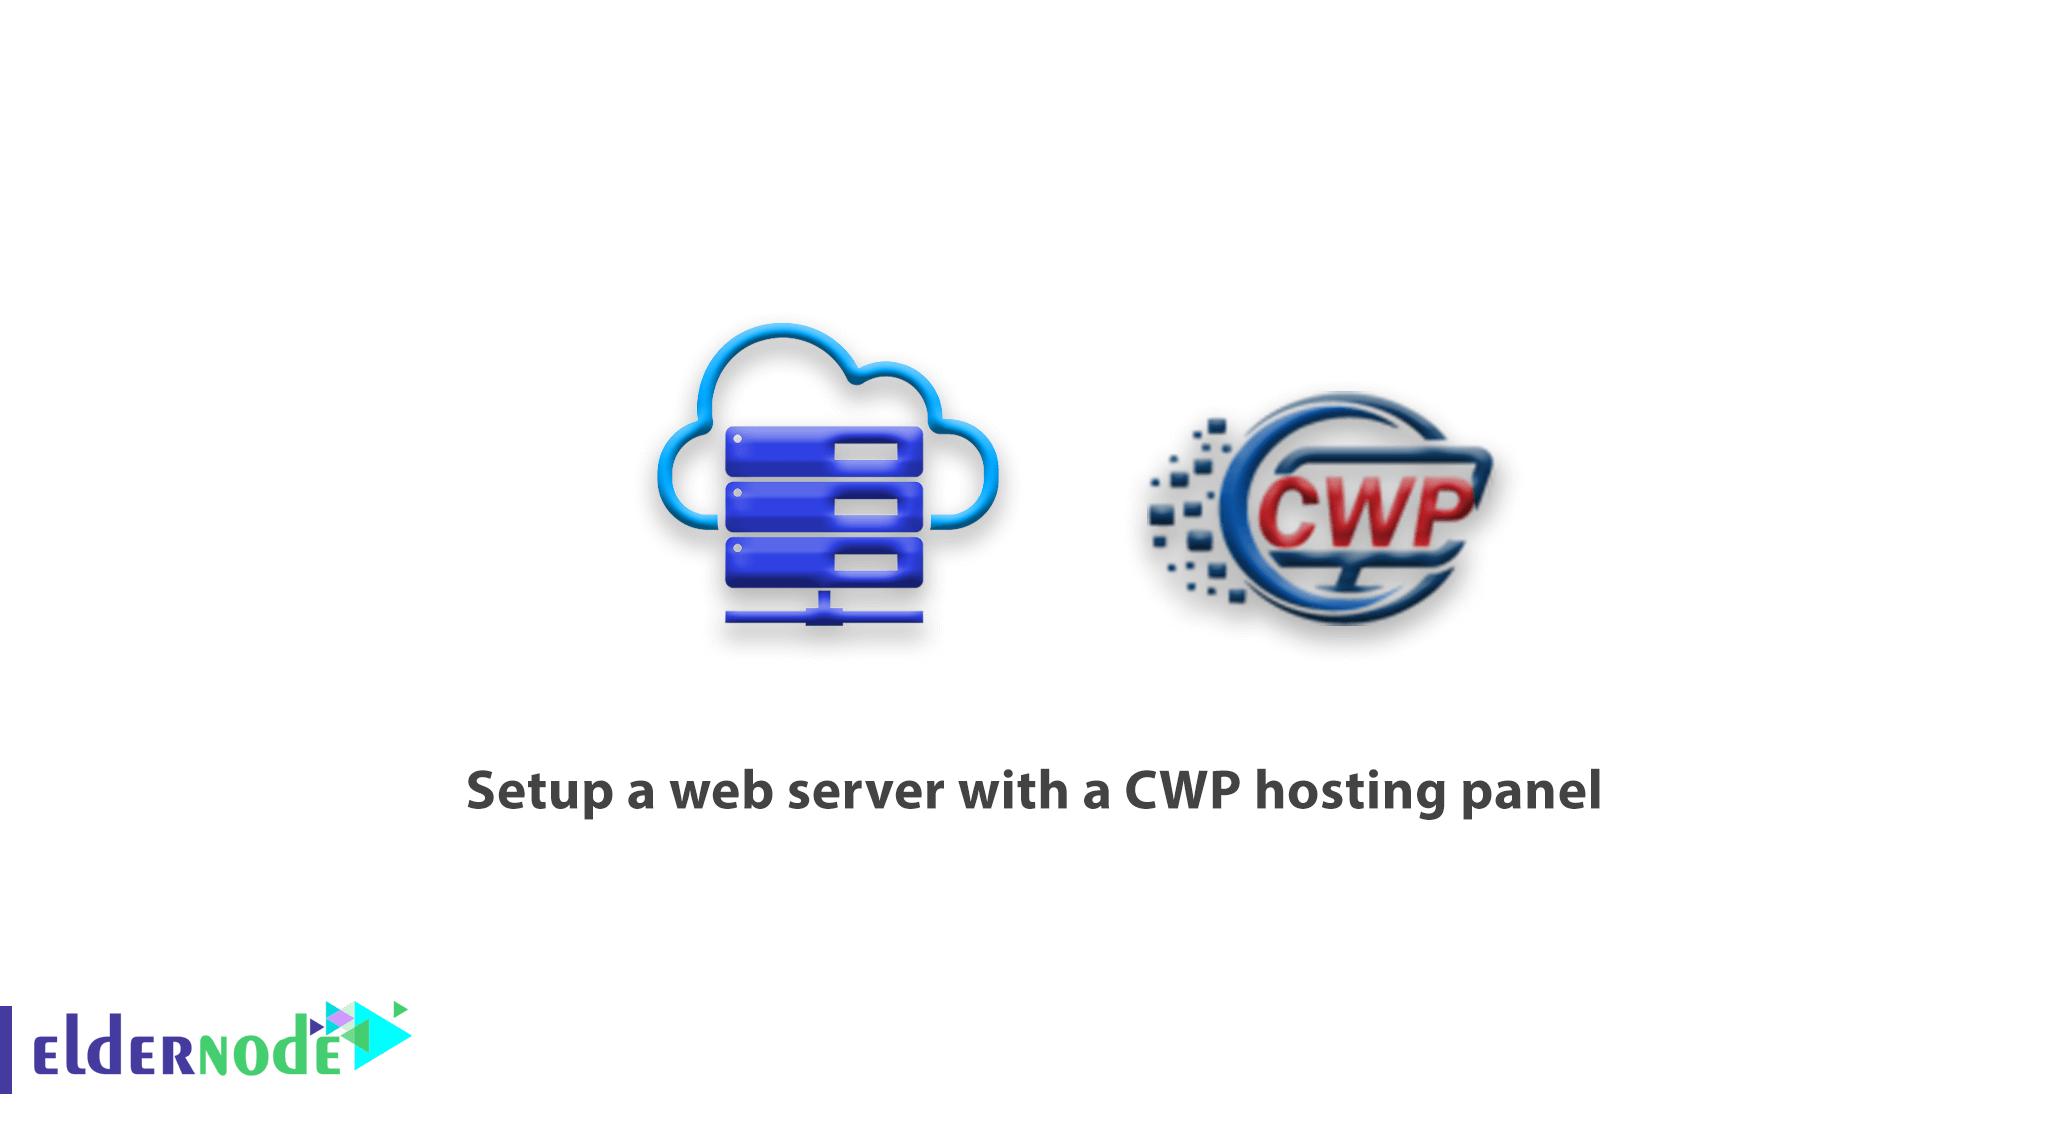 How to setup a web server with a CWP hosting panel